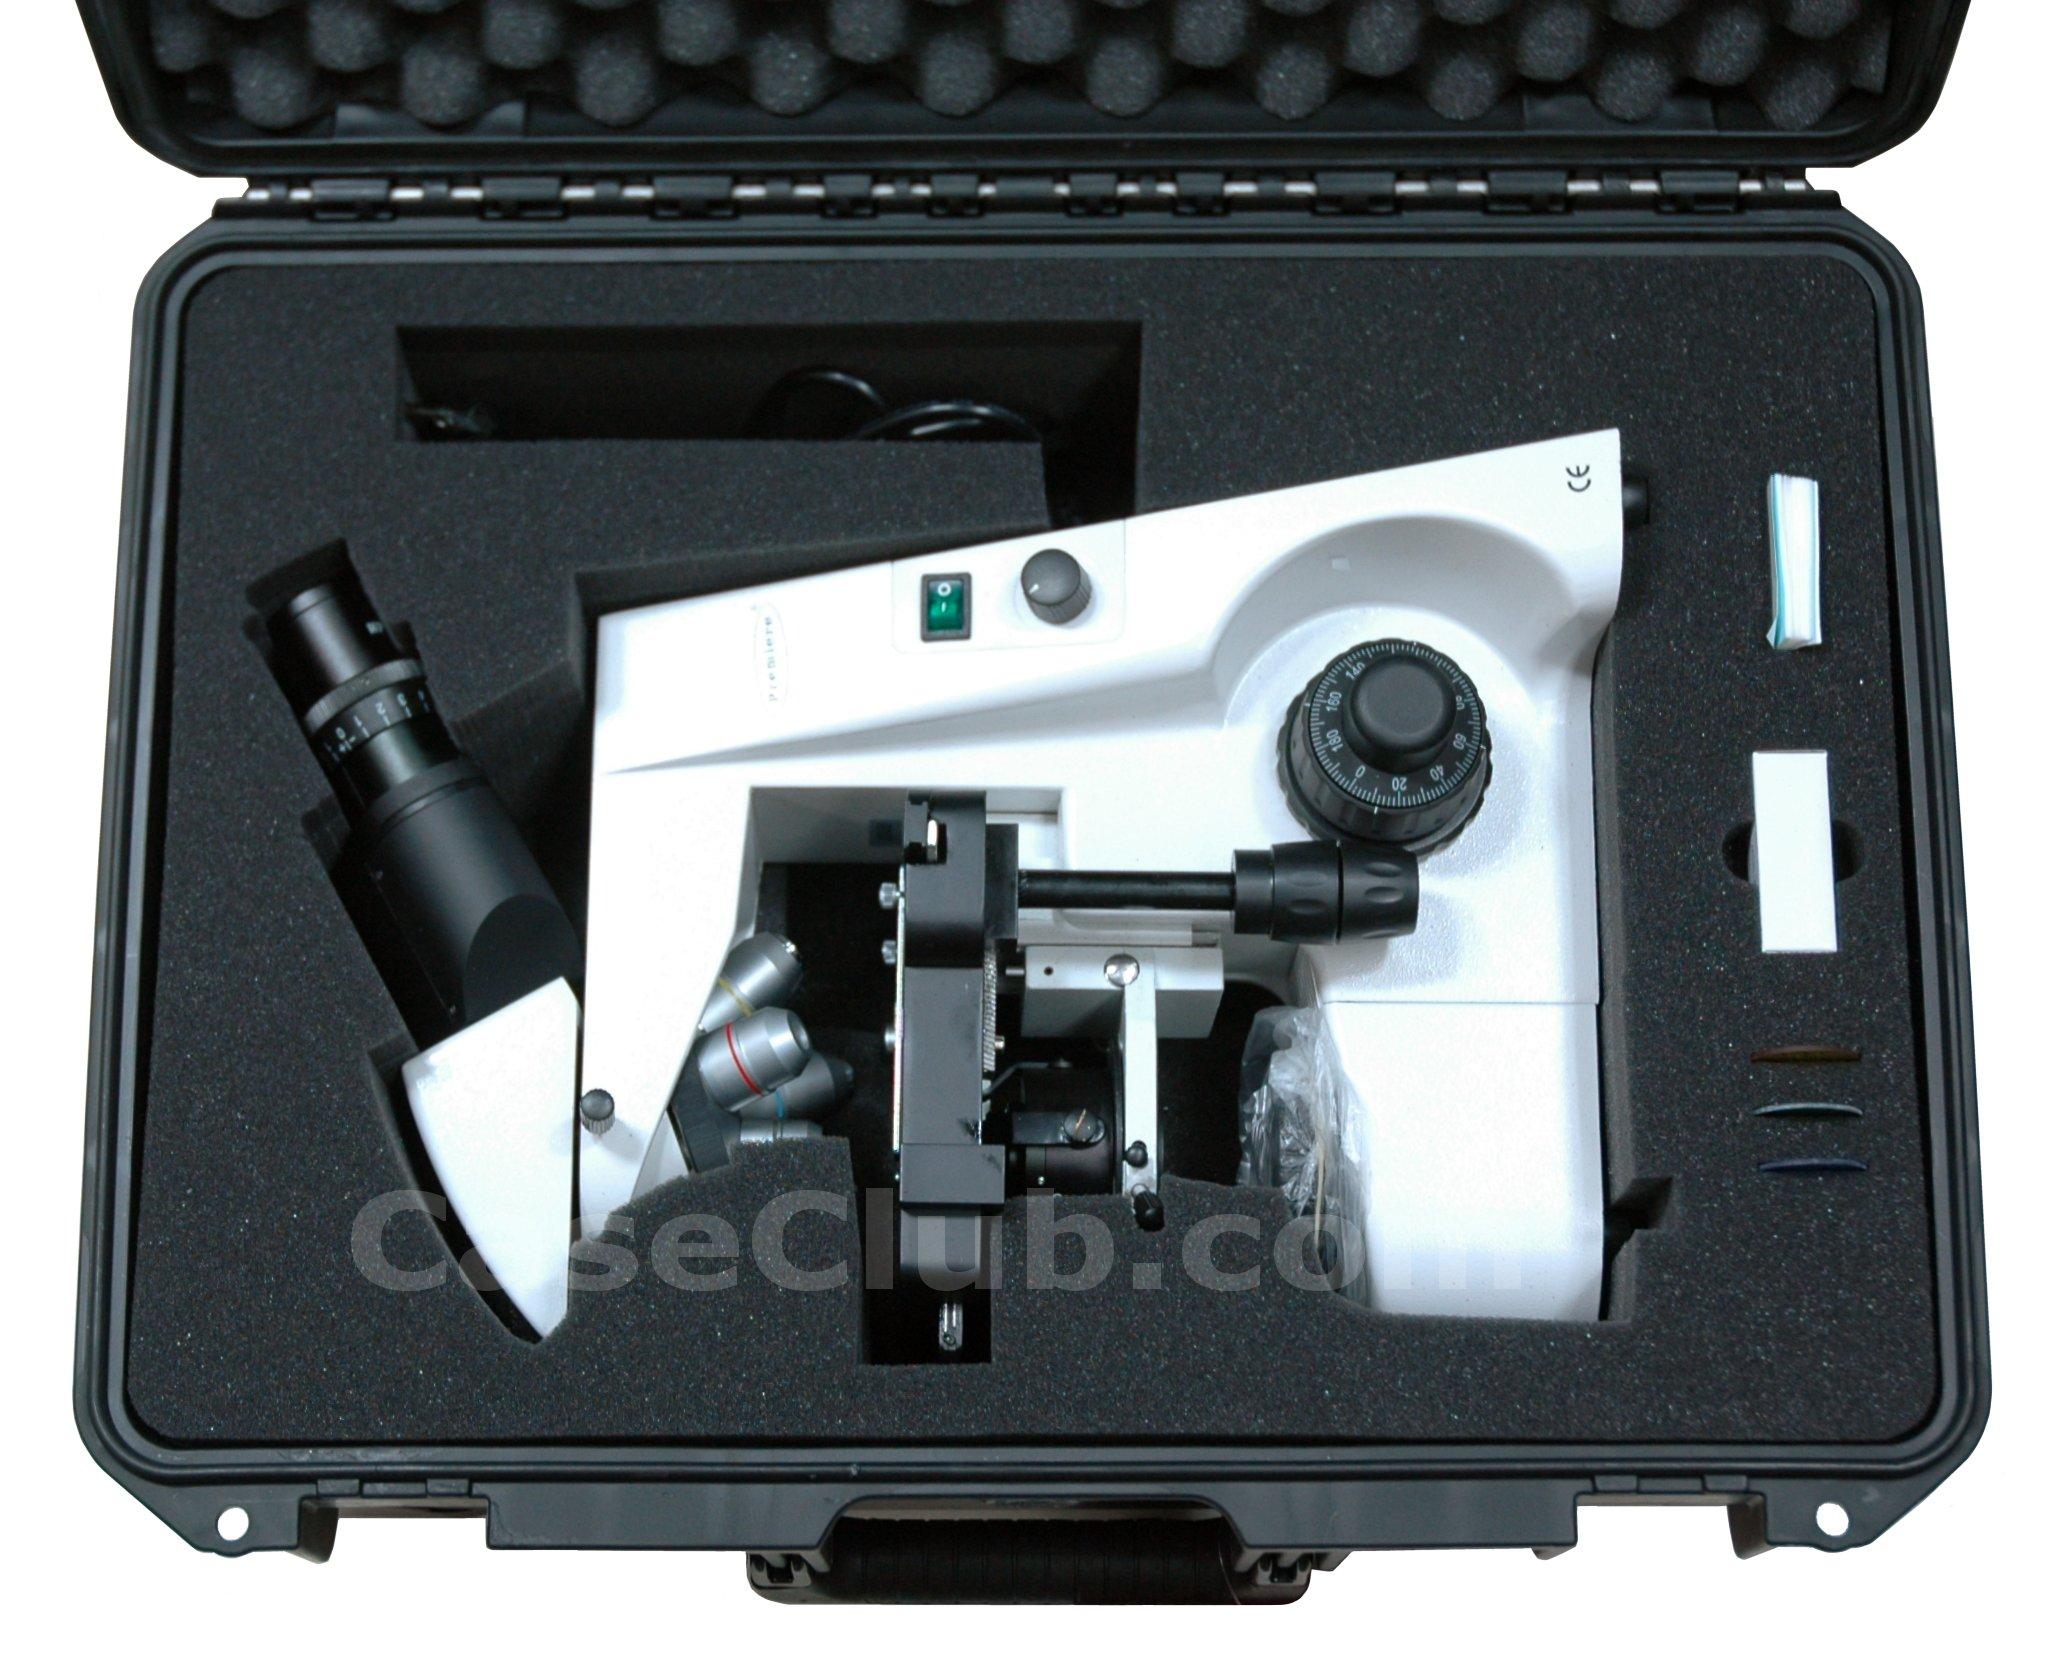 Case Club CC2620IMPE Case Custom Foam Example: Premiere MIS-5000 Microscope Case